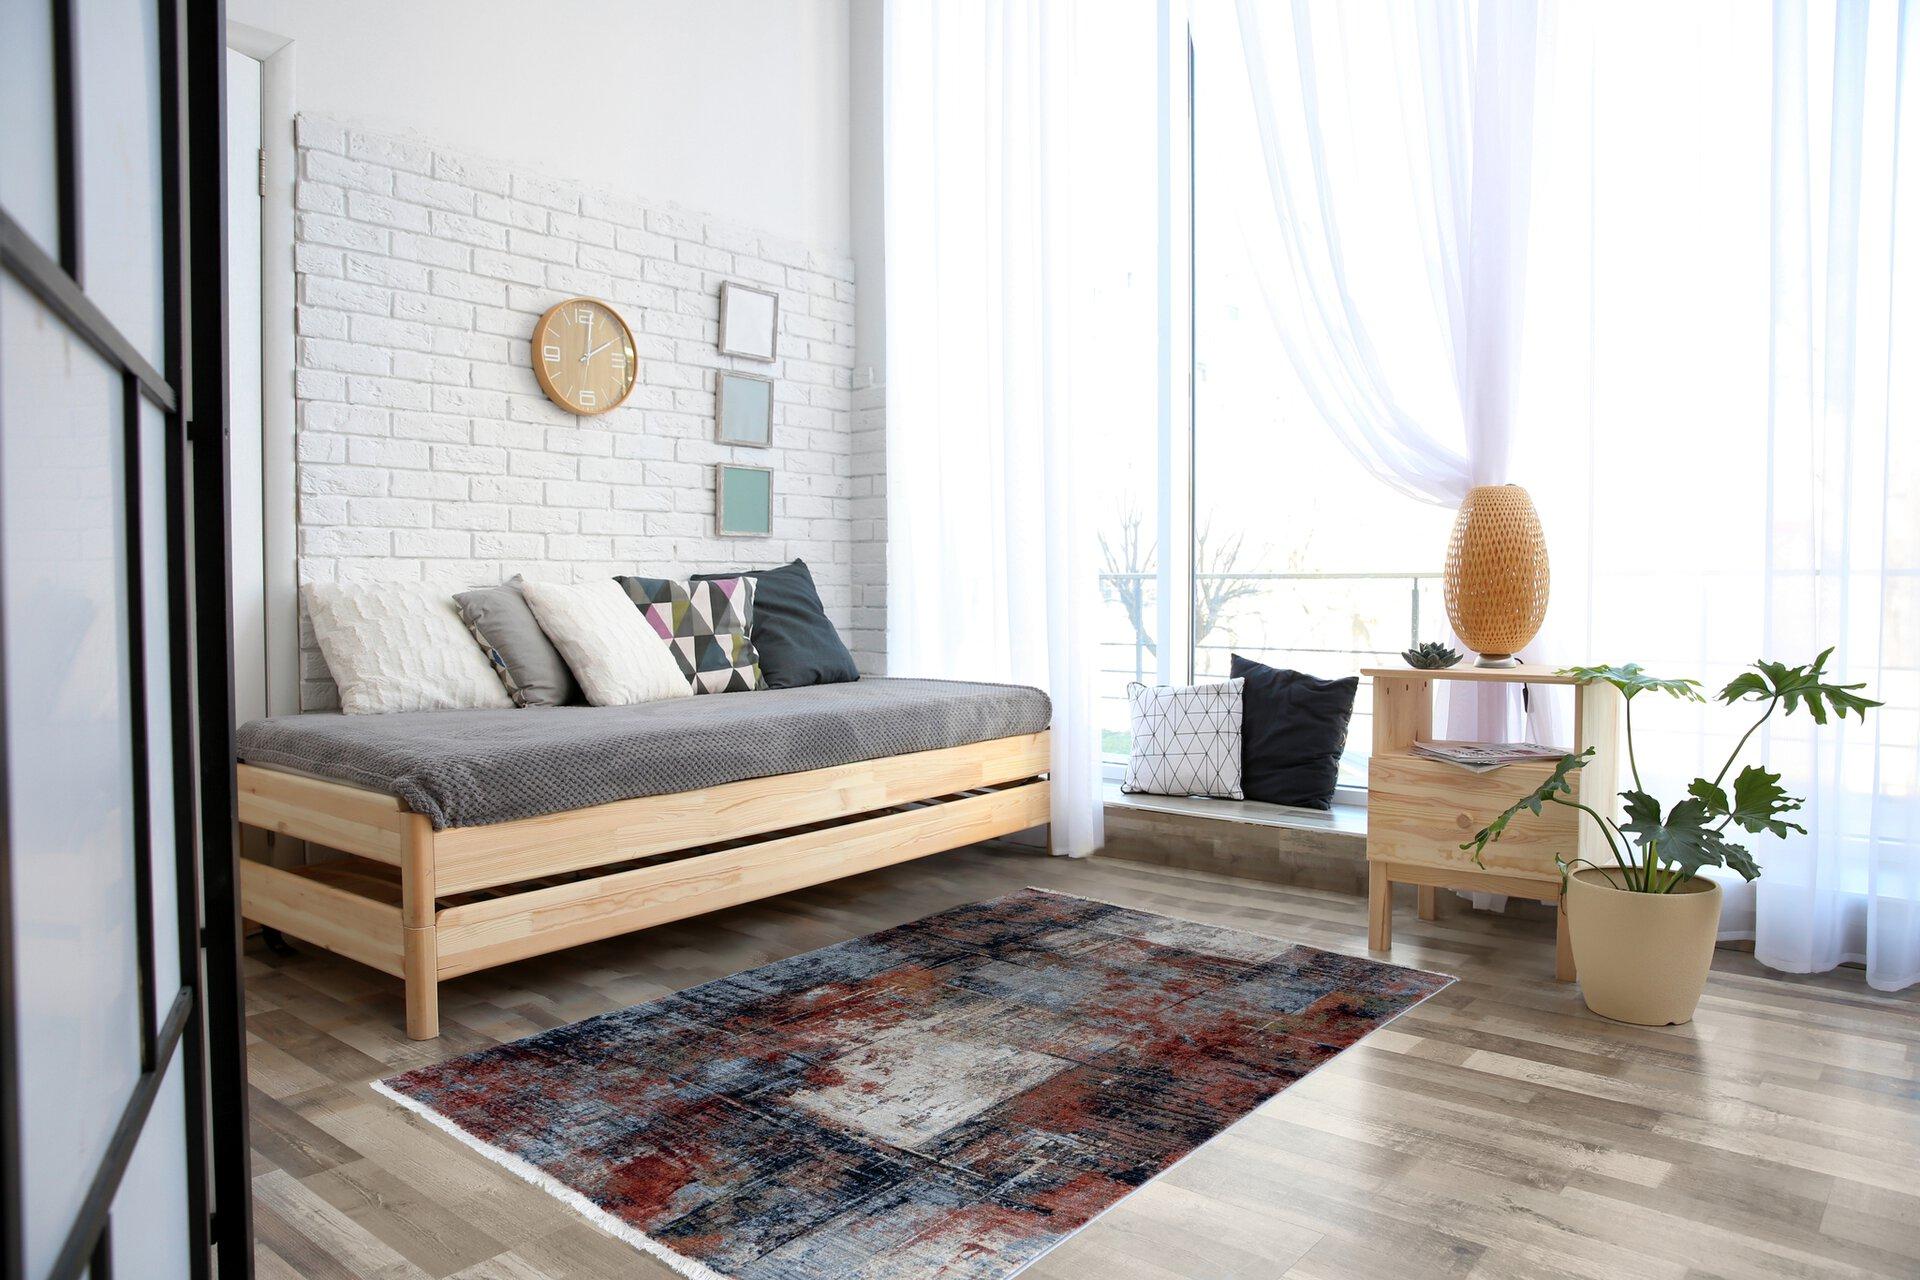 Maschinenwebteppich Sena Trendline Textil mehrfarbig 80 x 1 x 160 cm